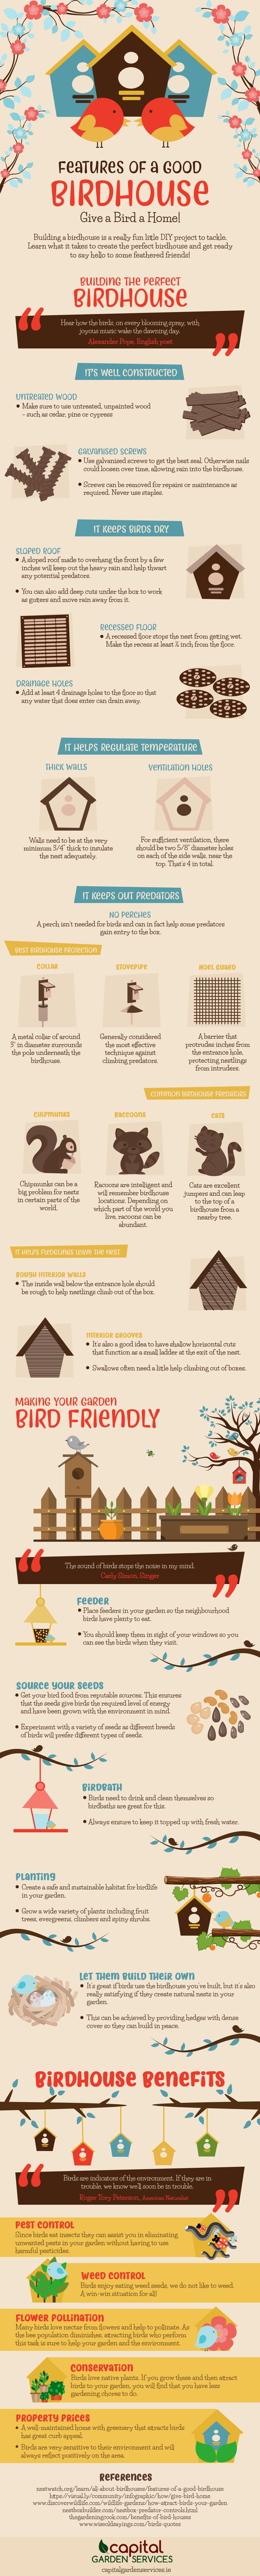 Building the perfect Birdhouse [Infographic]   ecogreenlove